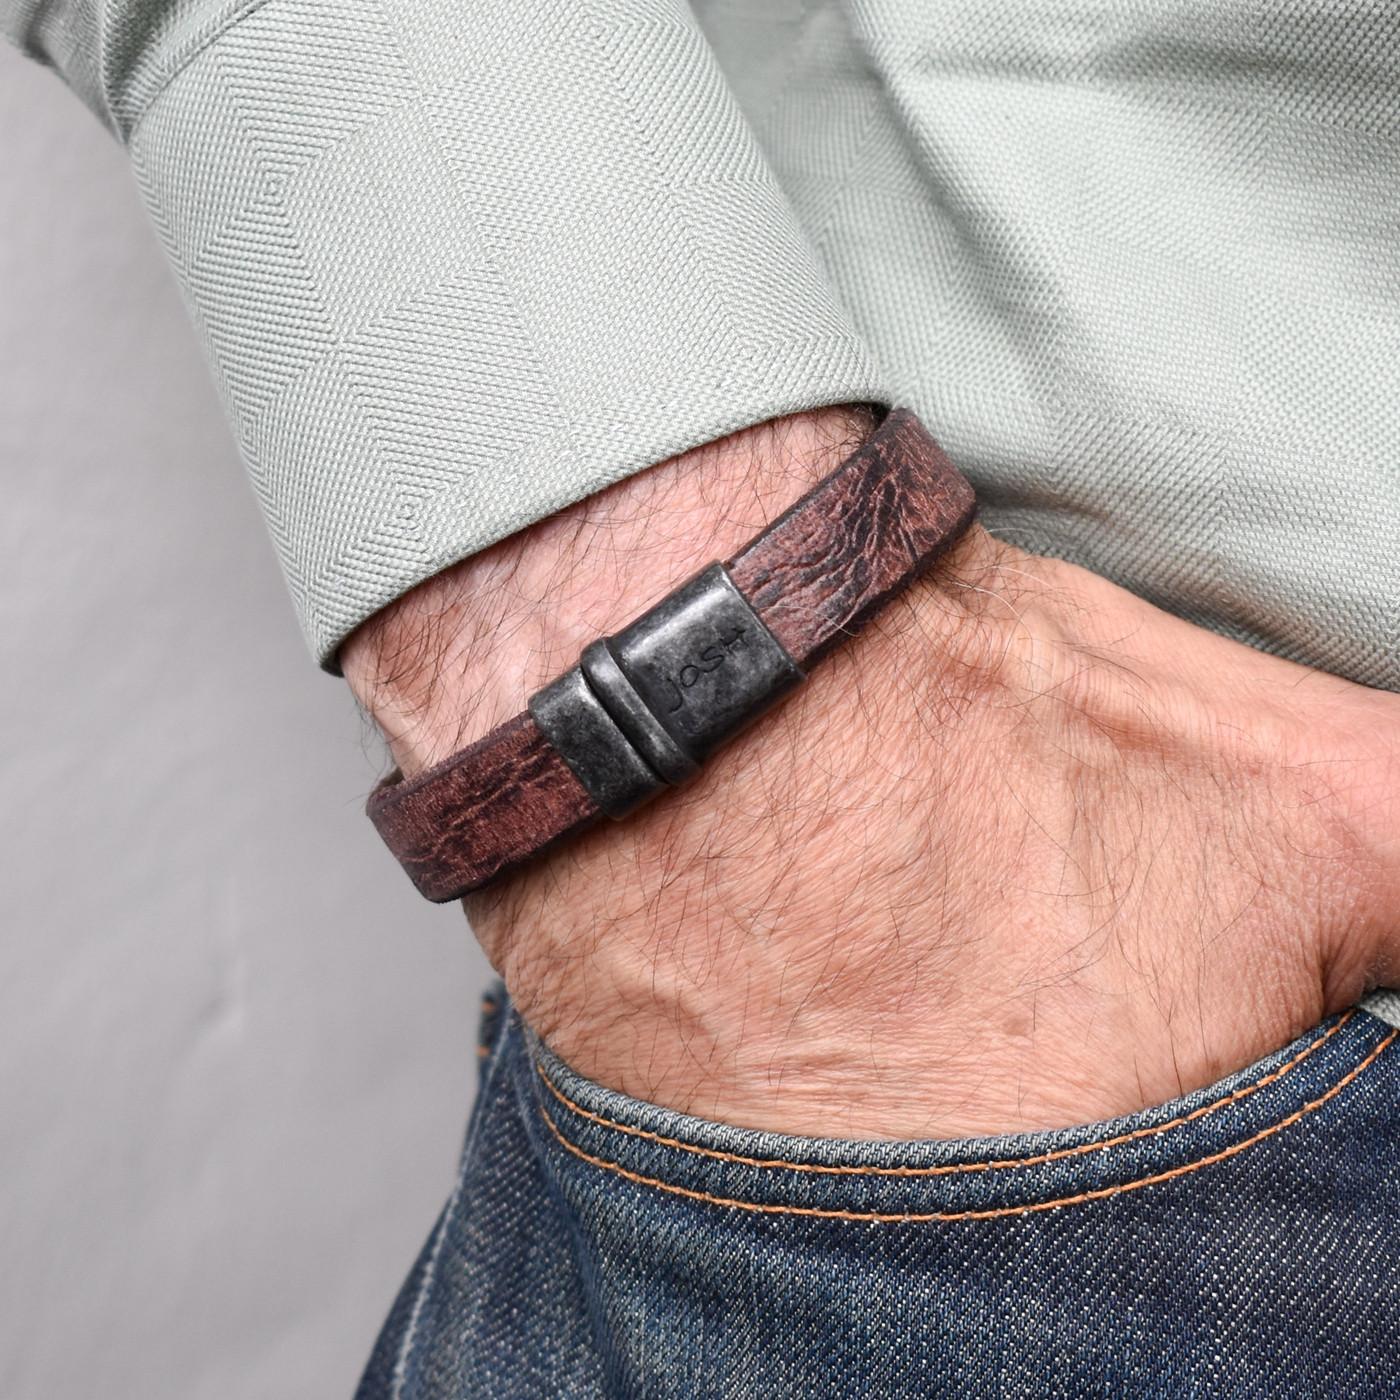 Josh Vintage Black/Brown Armband 09237-VB/BROWN (Lengte: 20.50-22.50 cm)